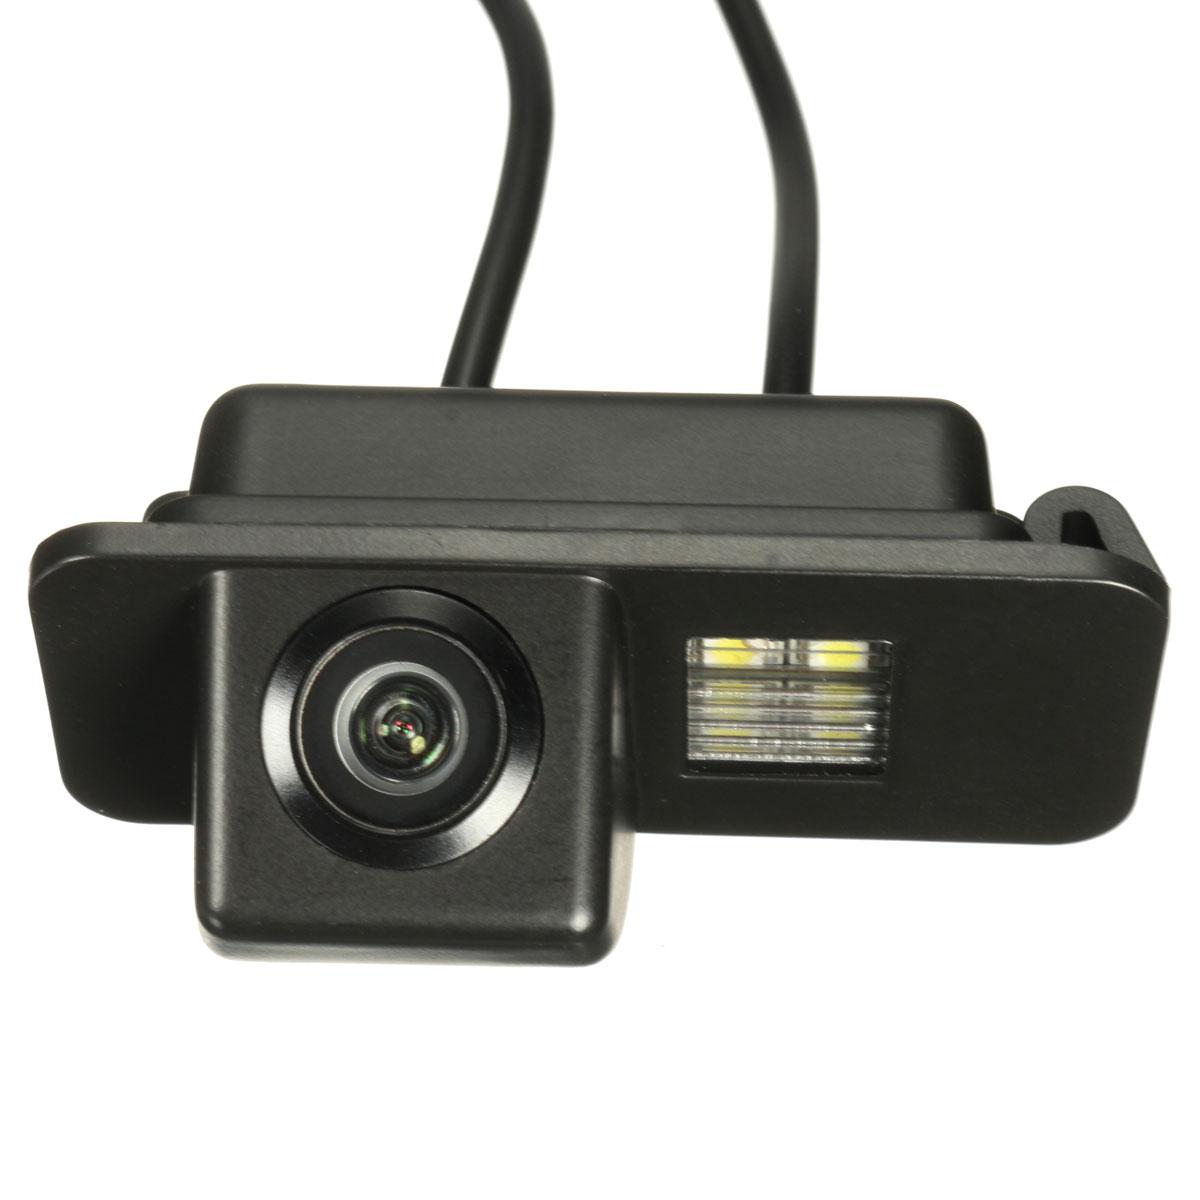 Telecamera retromarcia per Ford Mondeo S-Max Fiesta Kuga